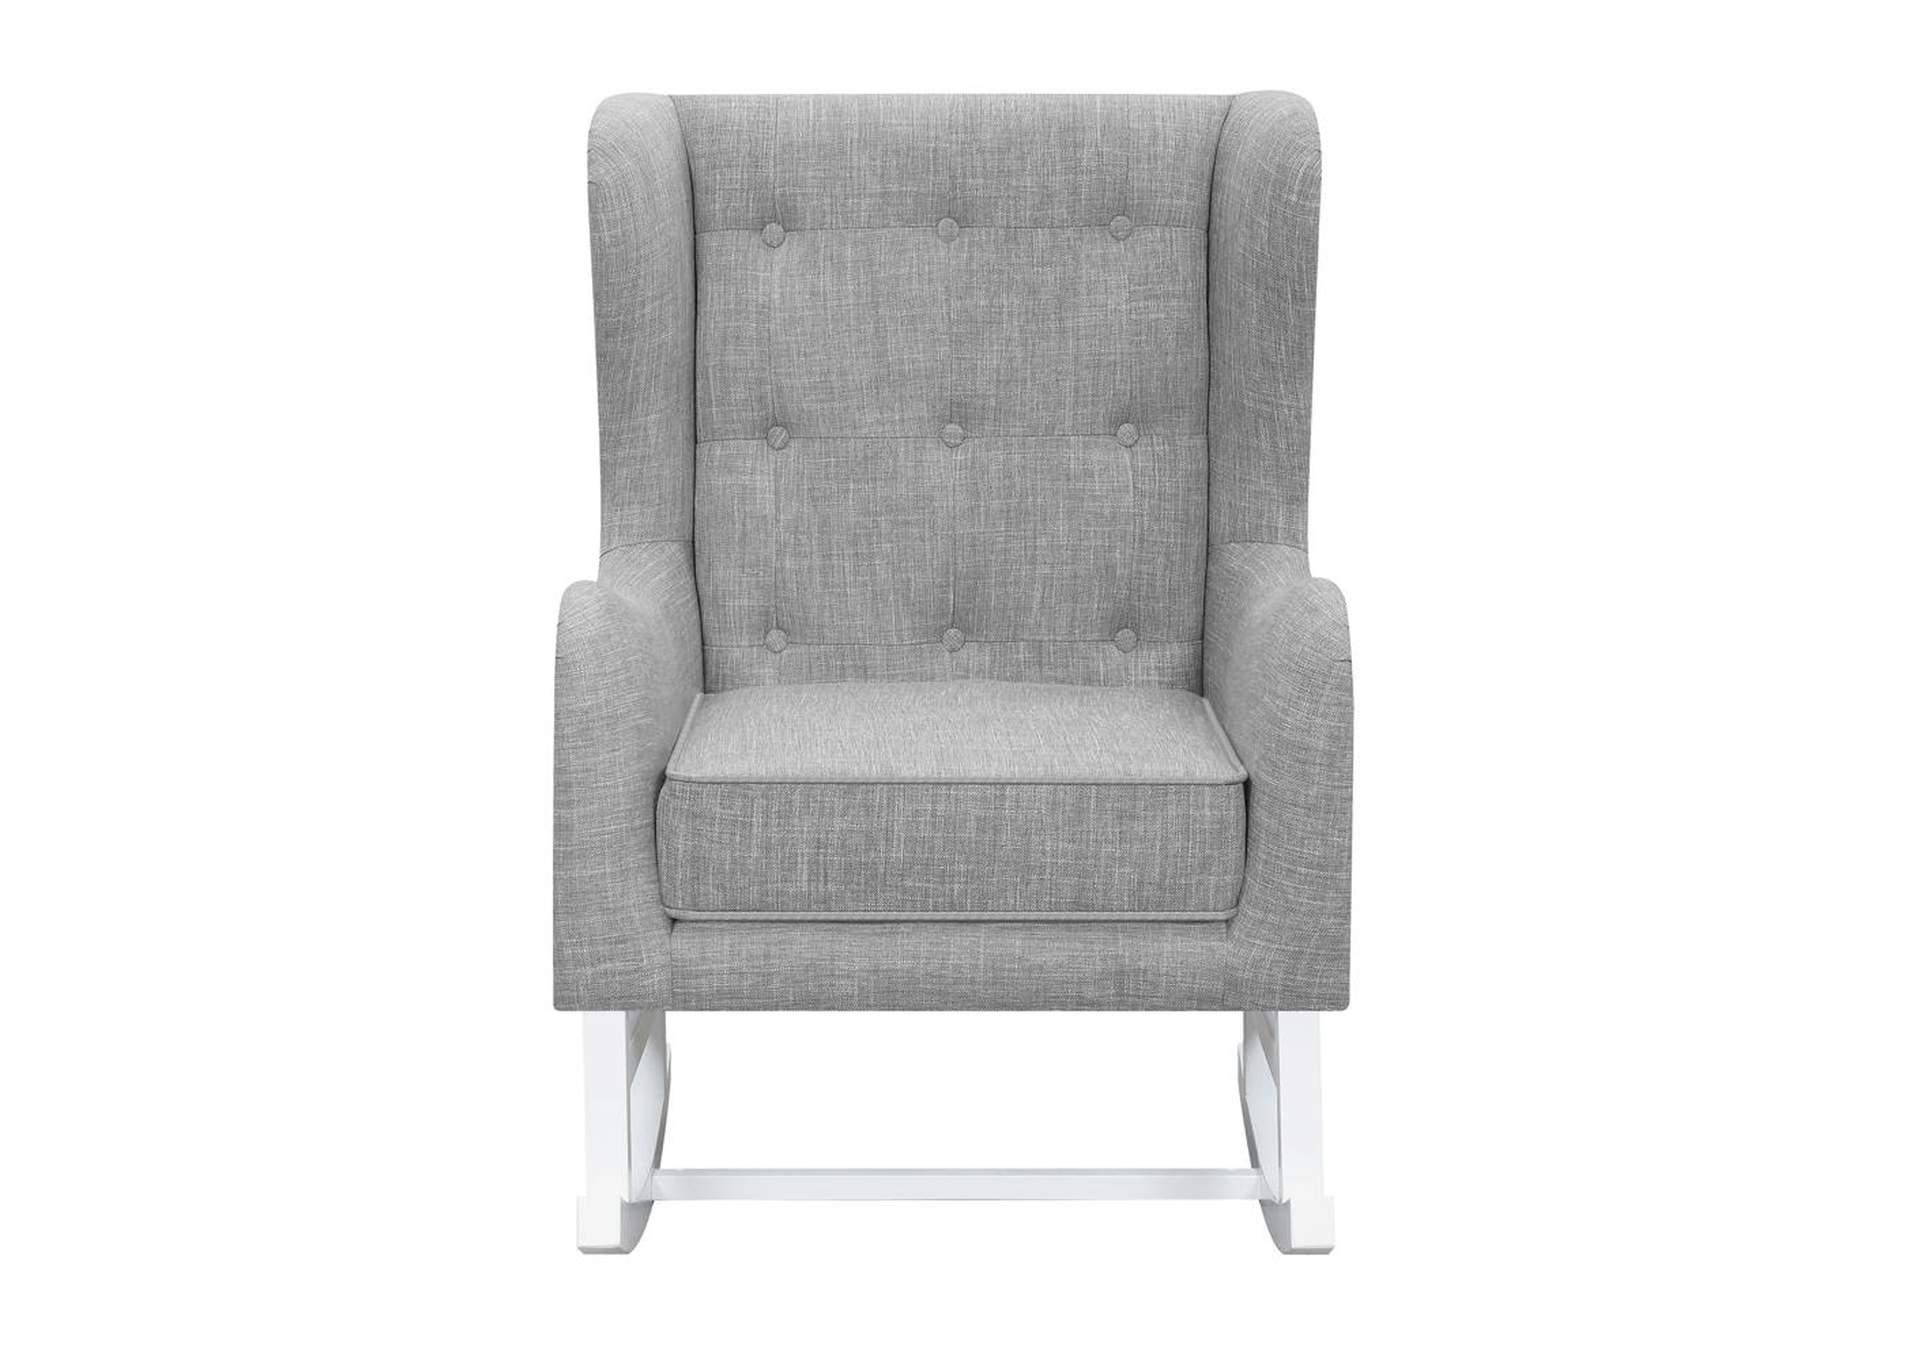 Super Overstock Furniture Langley Park Catonsville Alexandria Unemploymentrelief Wooden Chair Designs For Living Room Unemploymentrelieforg